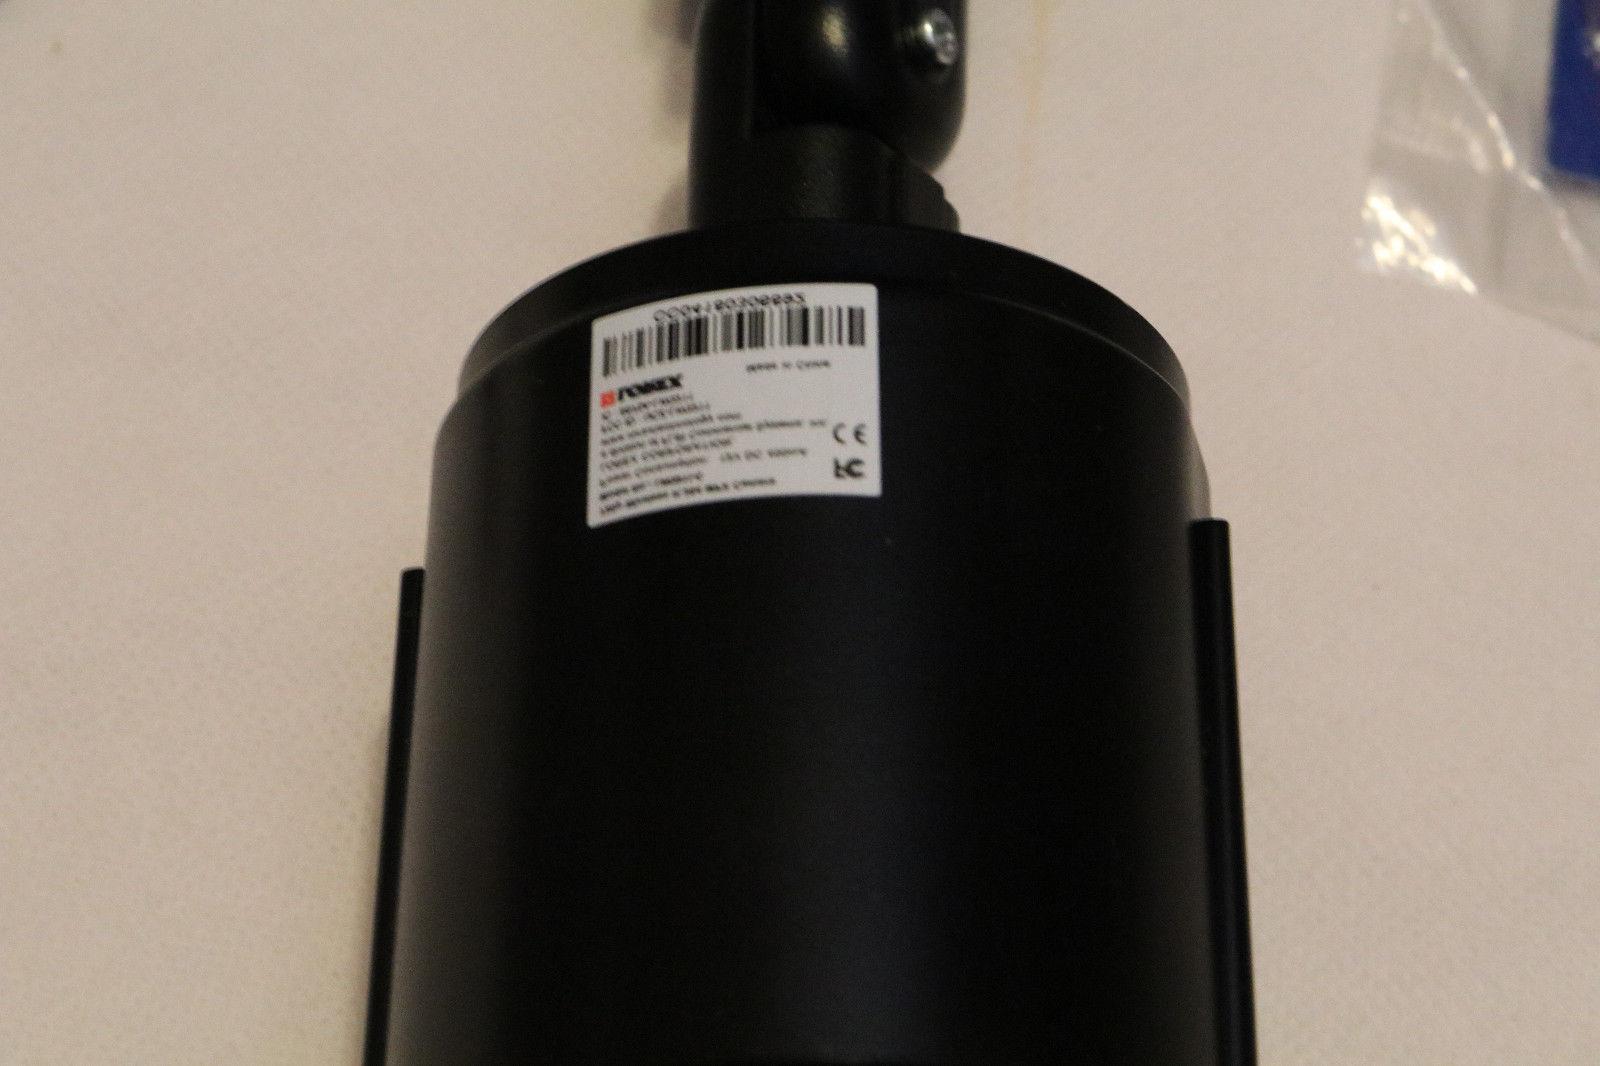 Lorex 720p Outdoor Security 135ft NV